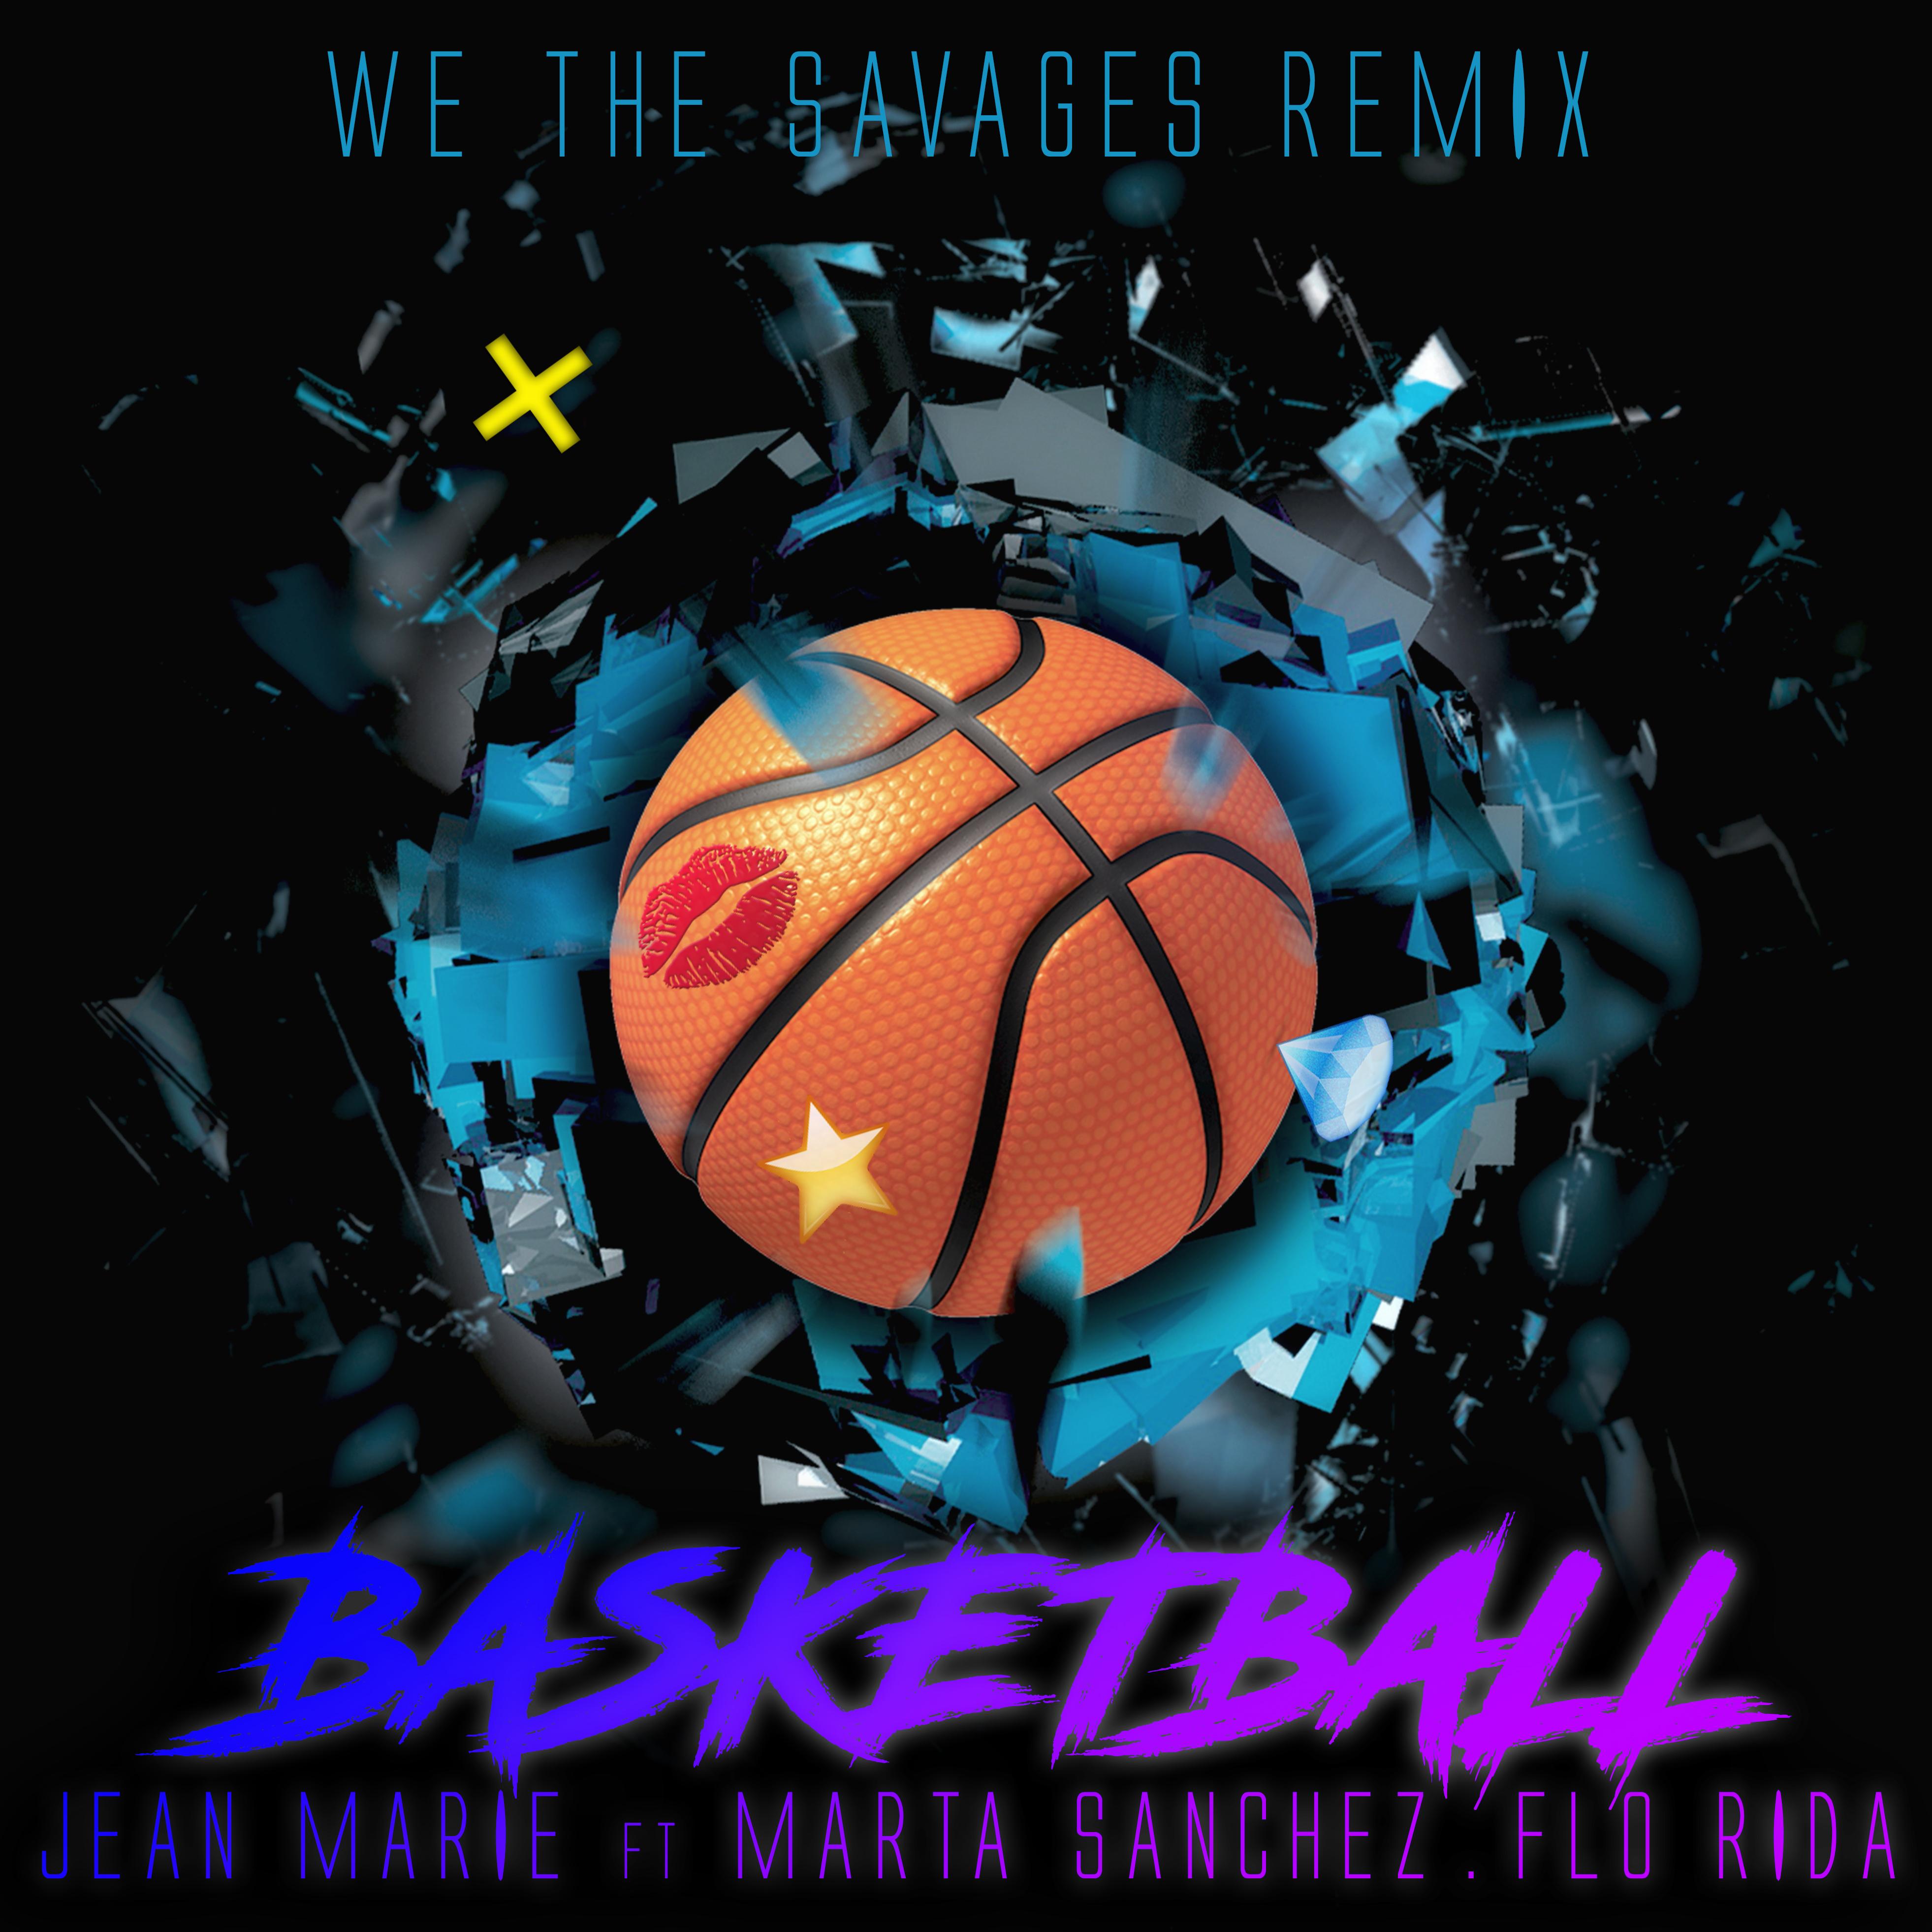 jean_marie_feat._marta_sanchez_flo_rida_-_basketball_we_the_savages_remix_sony_music.jpg